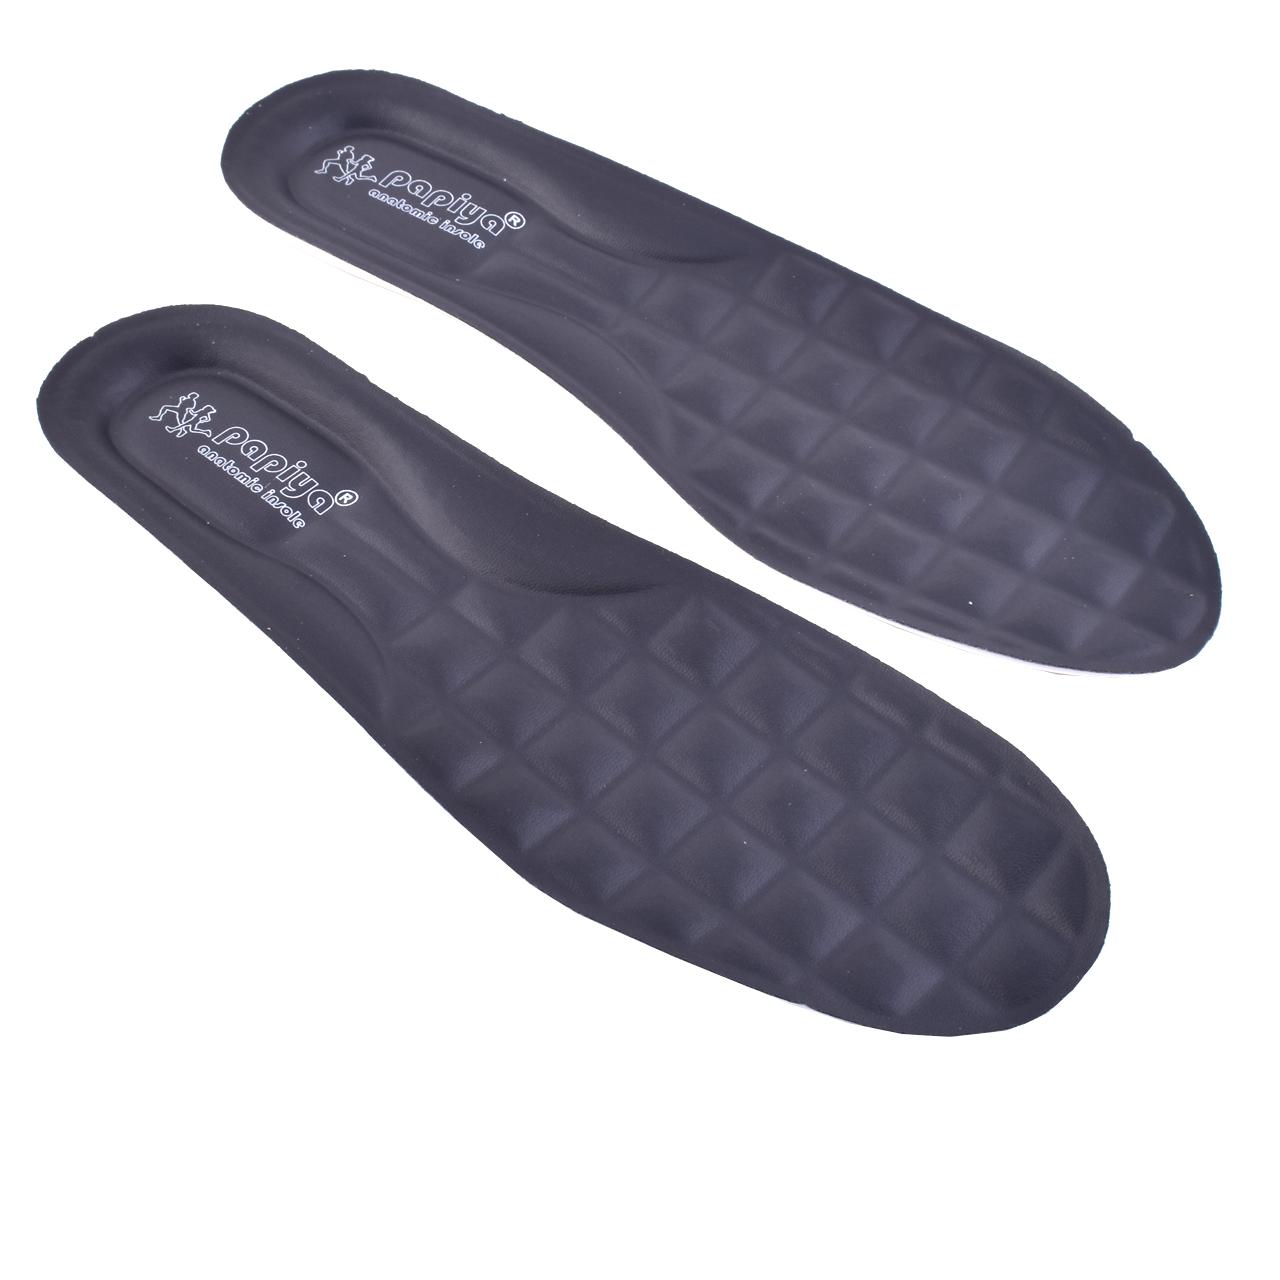 کفی طبی کفش نه پایپا کد A03 سایز 41-40